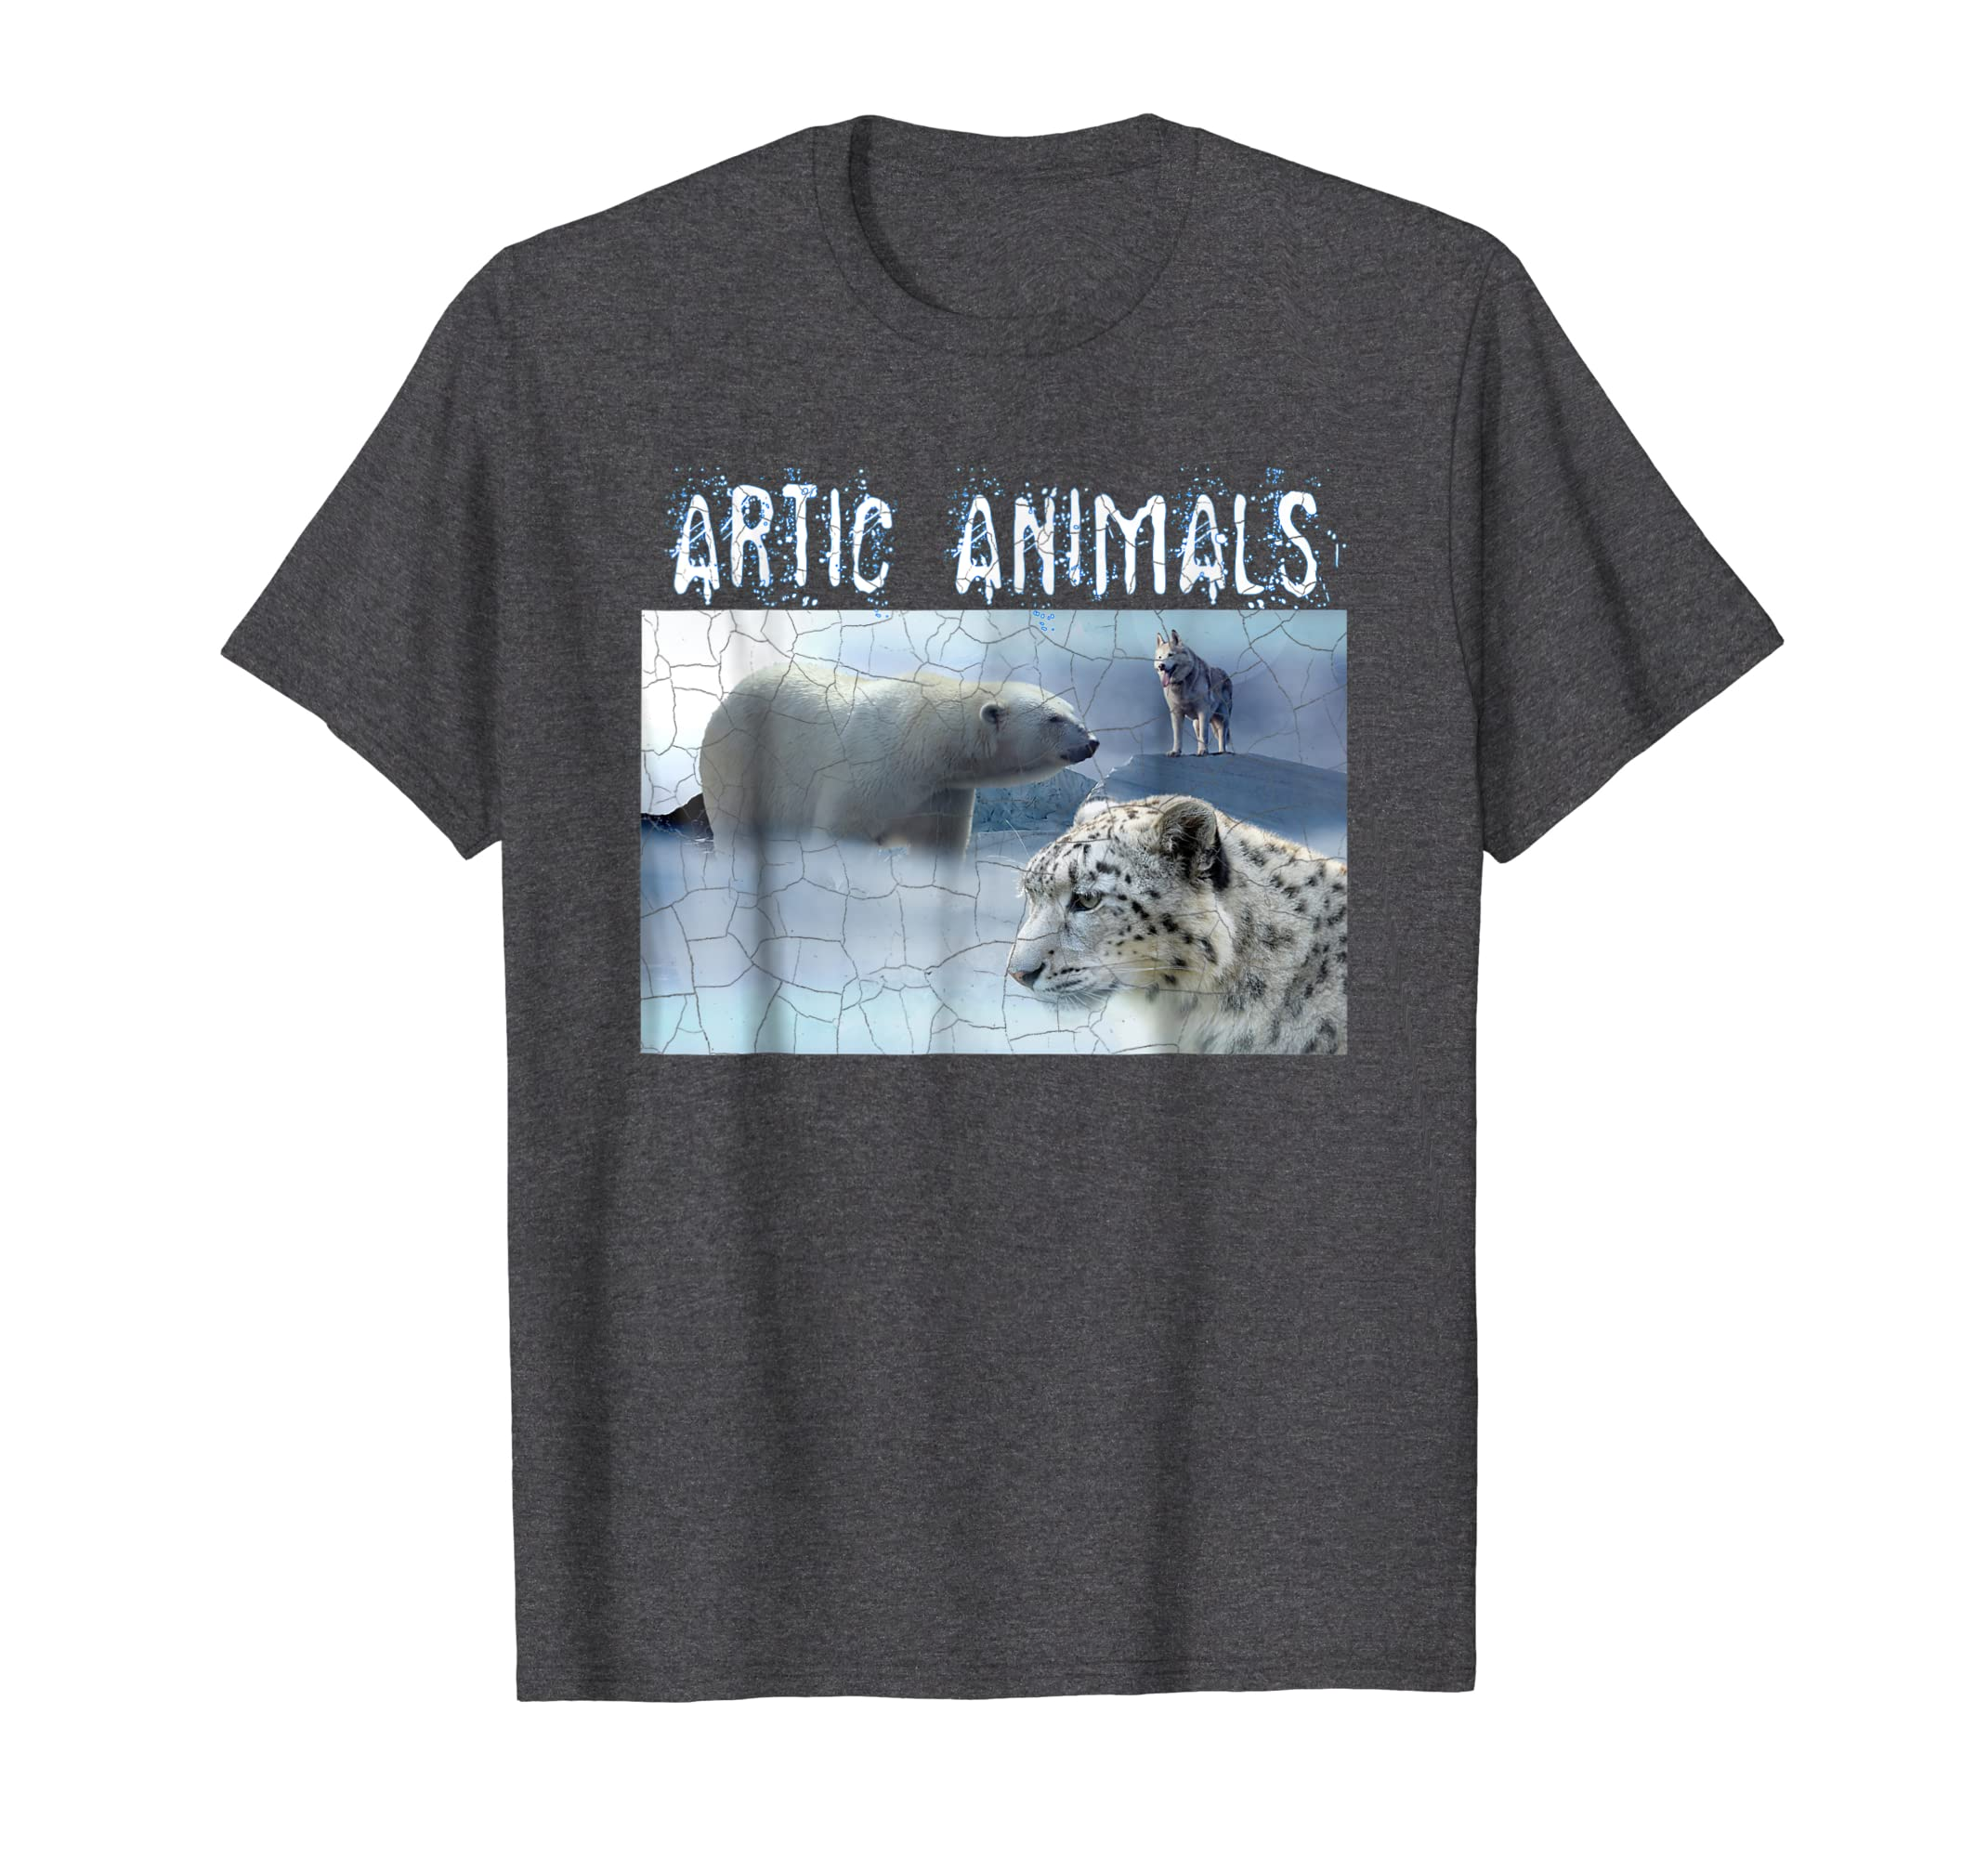 Artic Animals, PolarBear Alaskan Malamute Snow Leopard Shirt-AZP